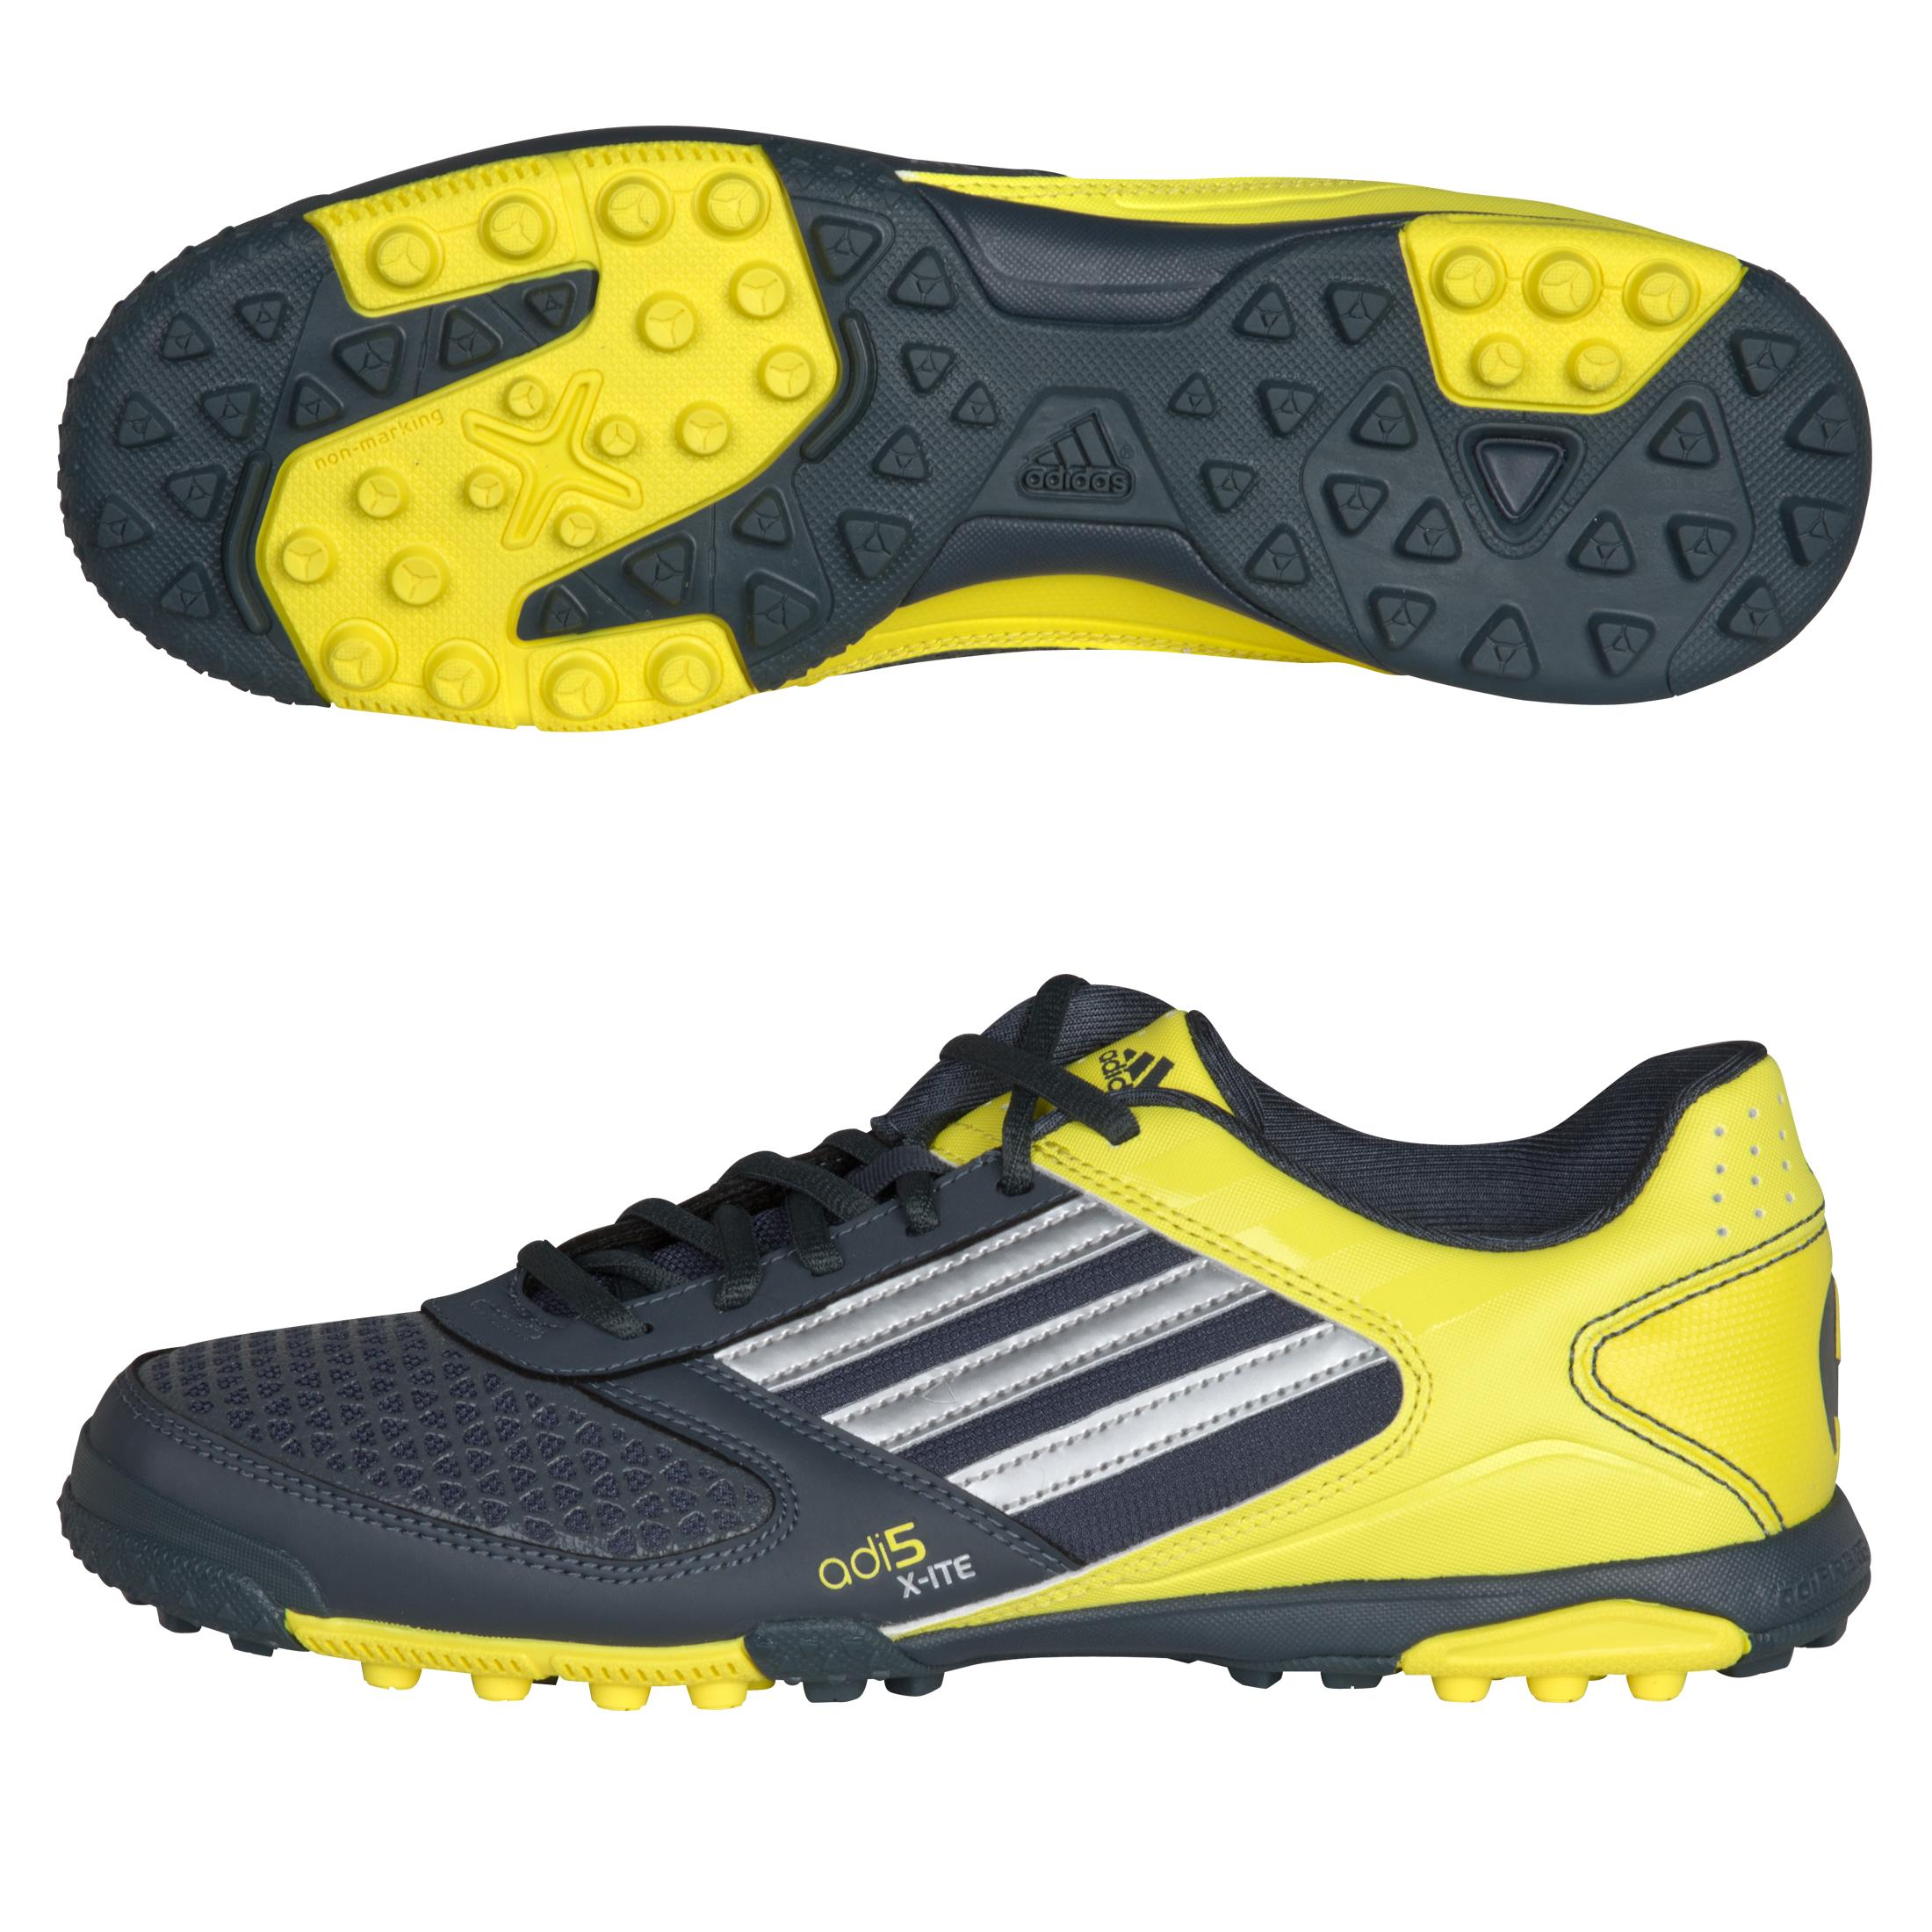 adidas adi5 X-ite Astro Turf Trainers - Dark Onix / Metallic Silver / Lemon Peel